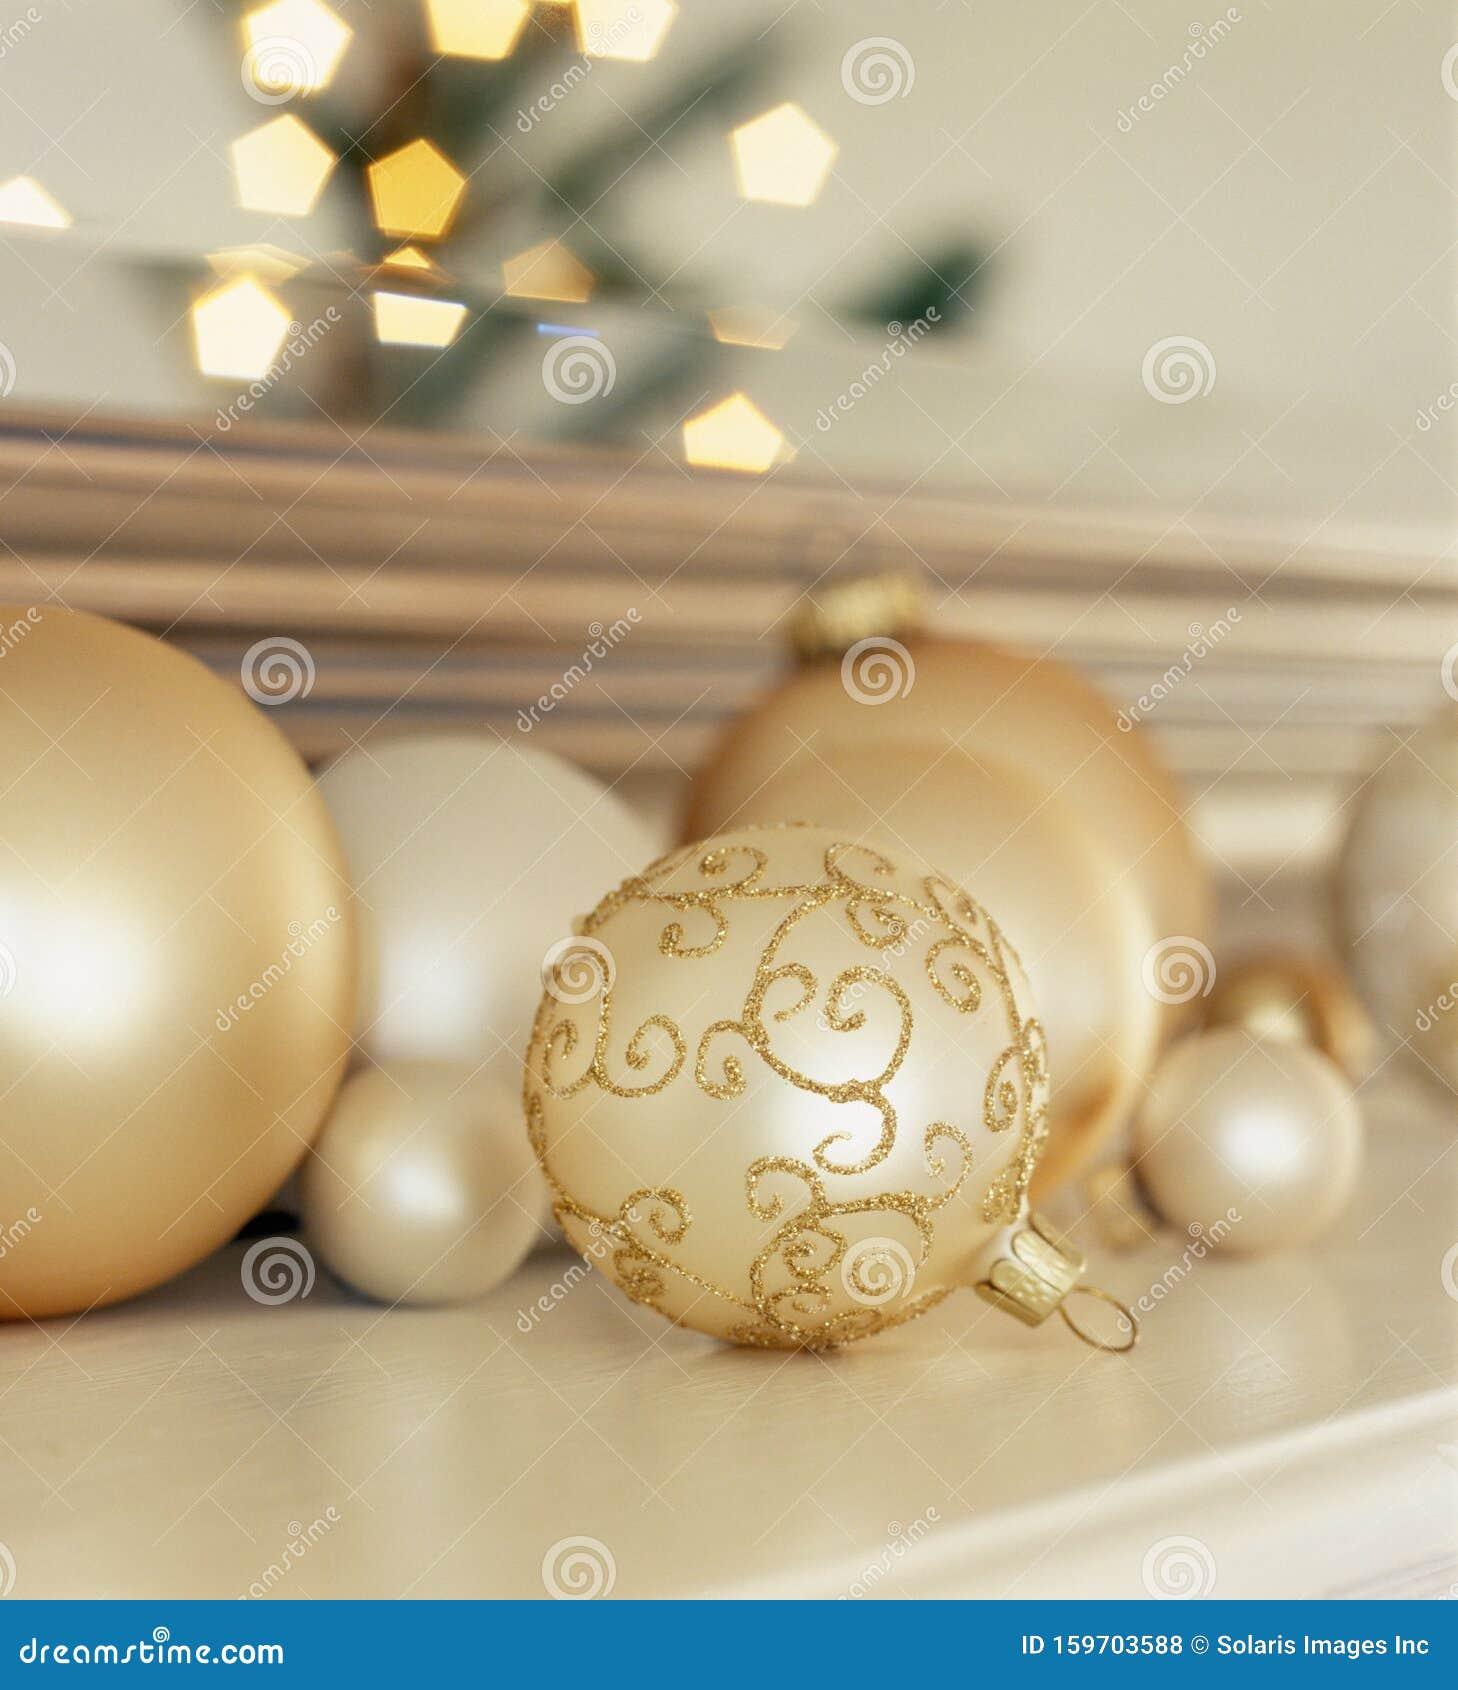 Group Of Glass Christmas Ornaments On Living Room Mantel